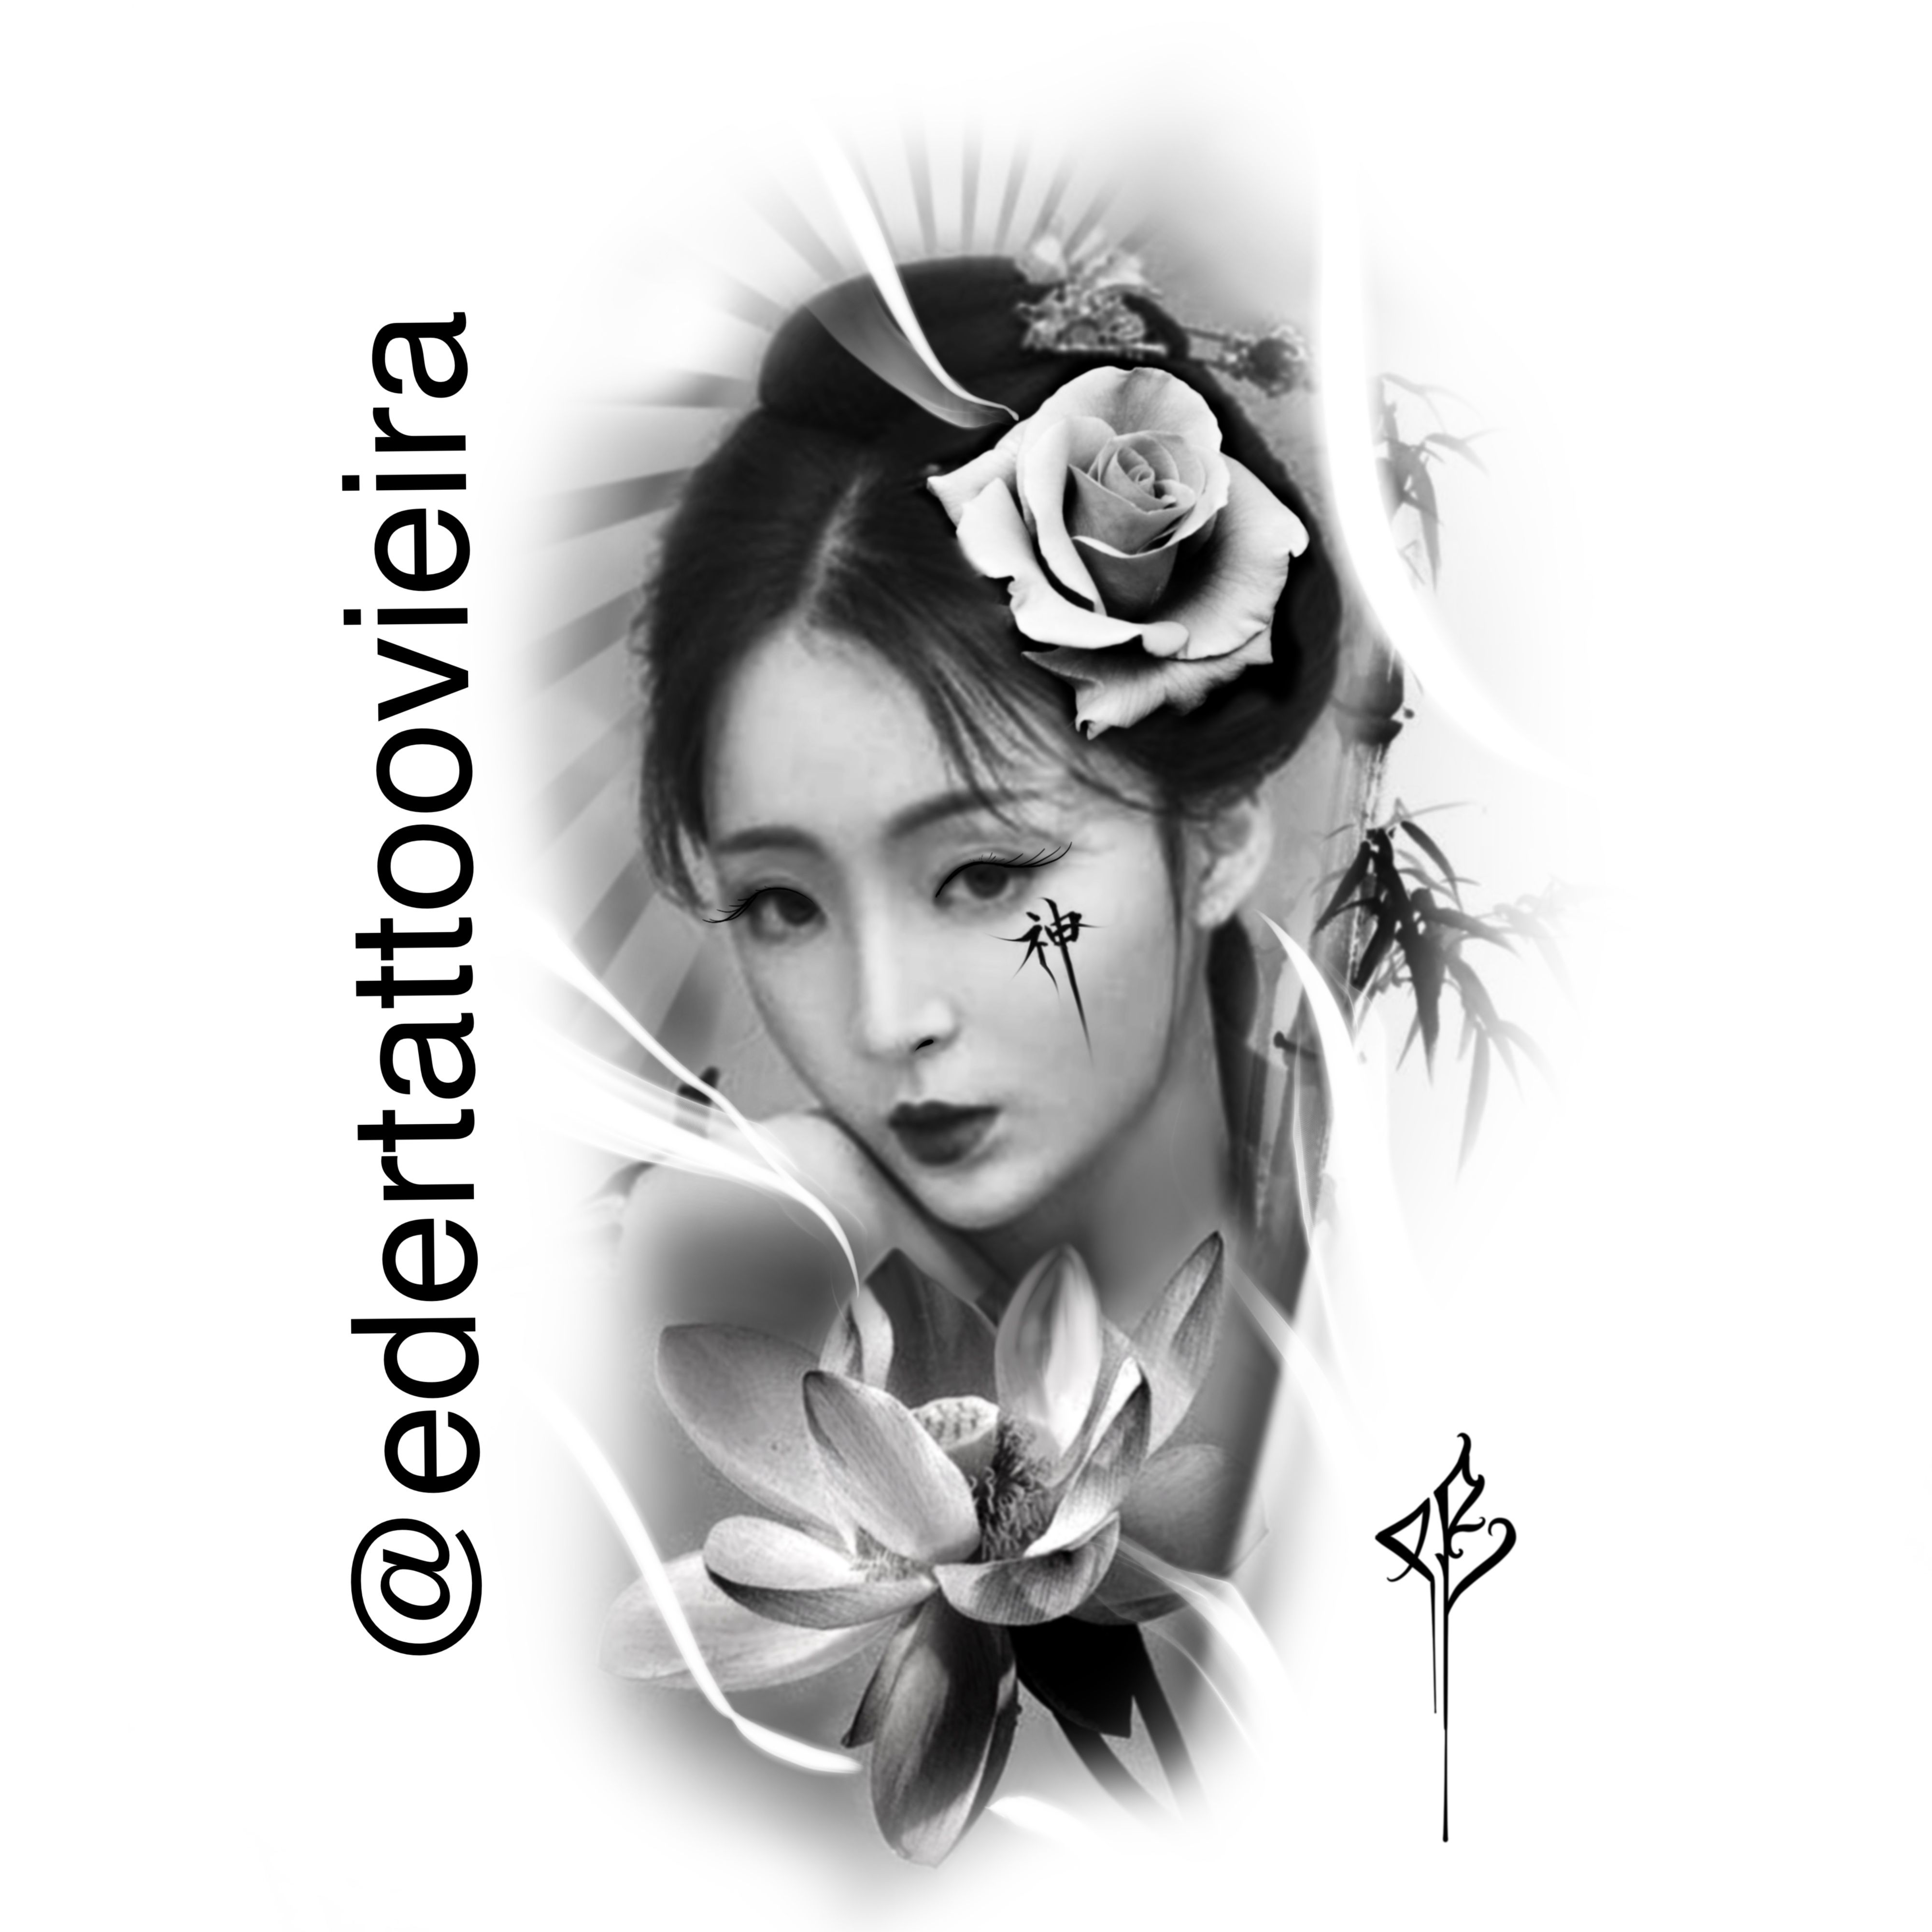 302 Gambar Geisha Terbaik